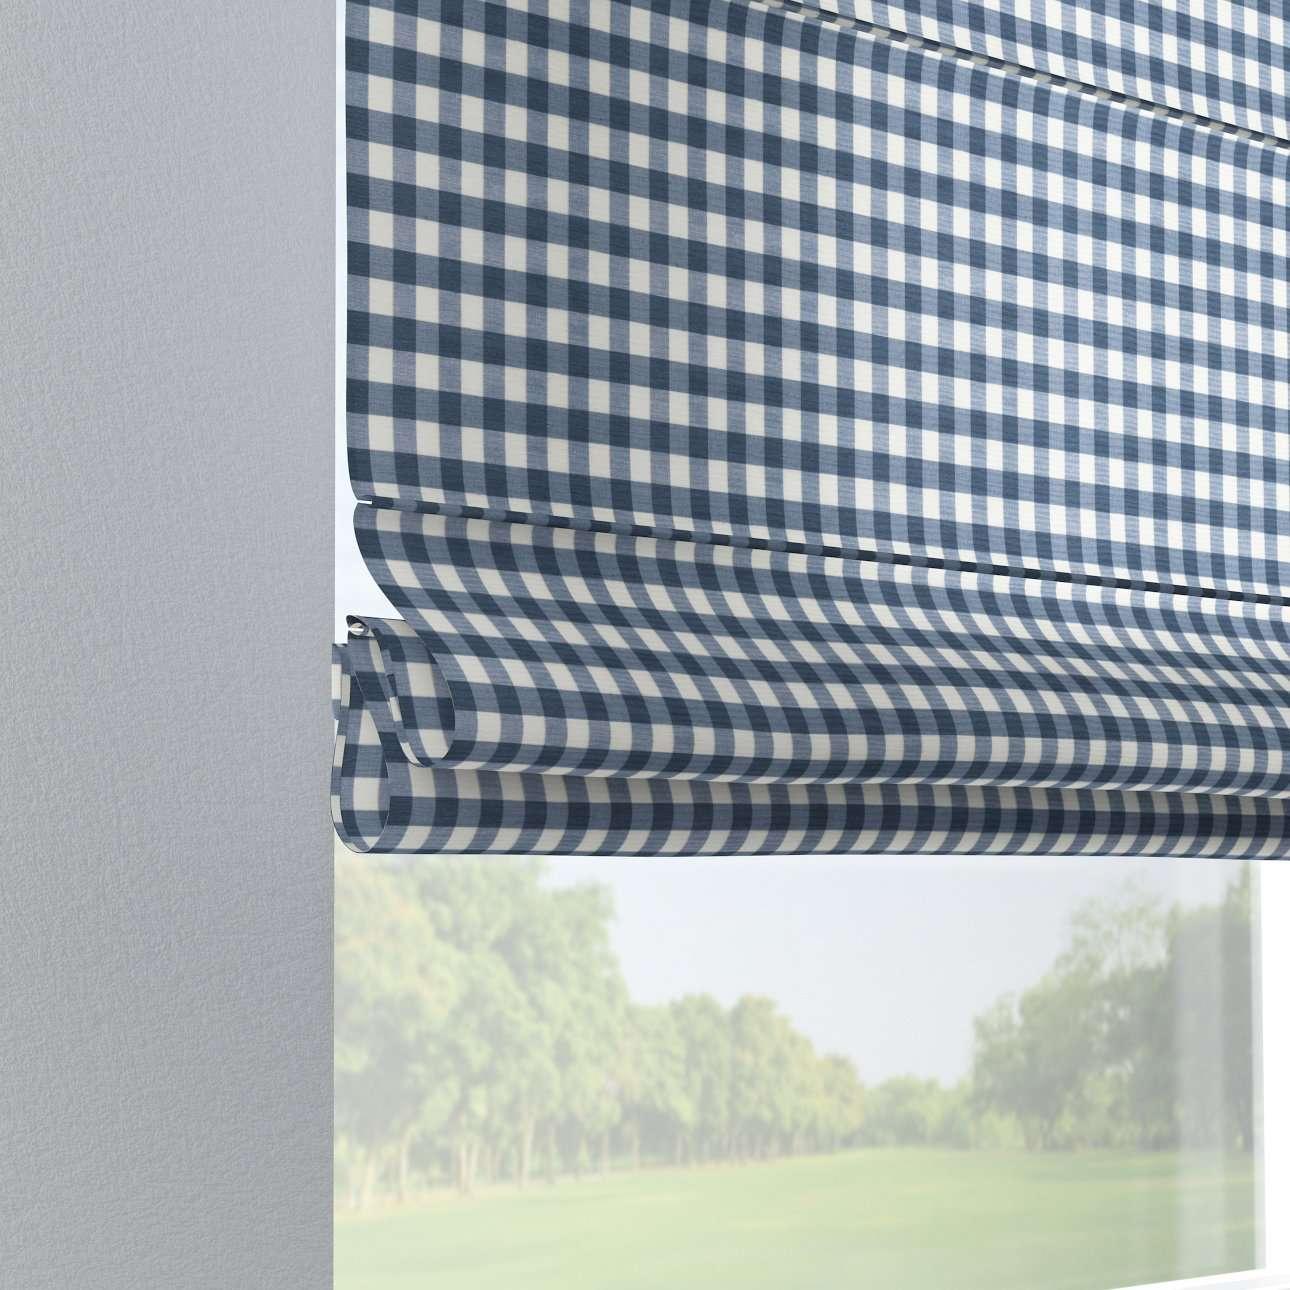 Raffrollo Verona 80 x 170 cm von der Kollektion Quadro, Stoff: 136-01